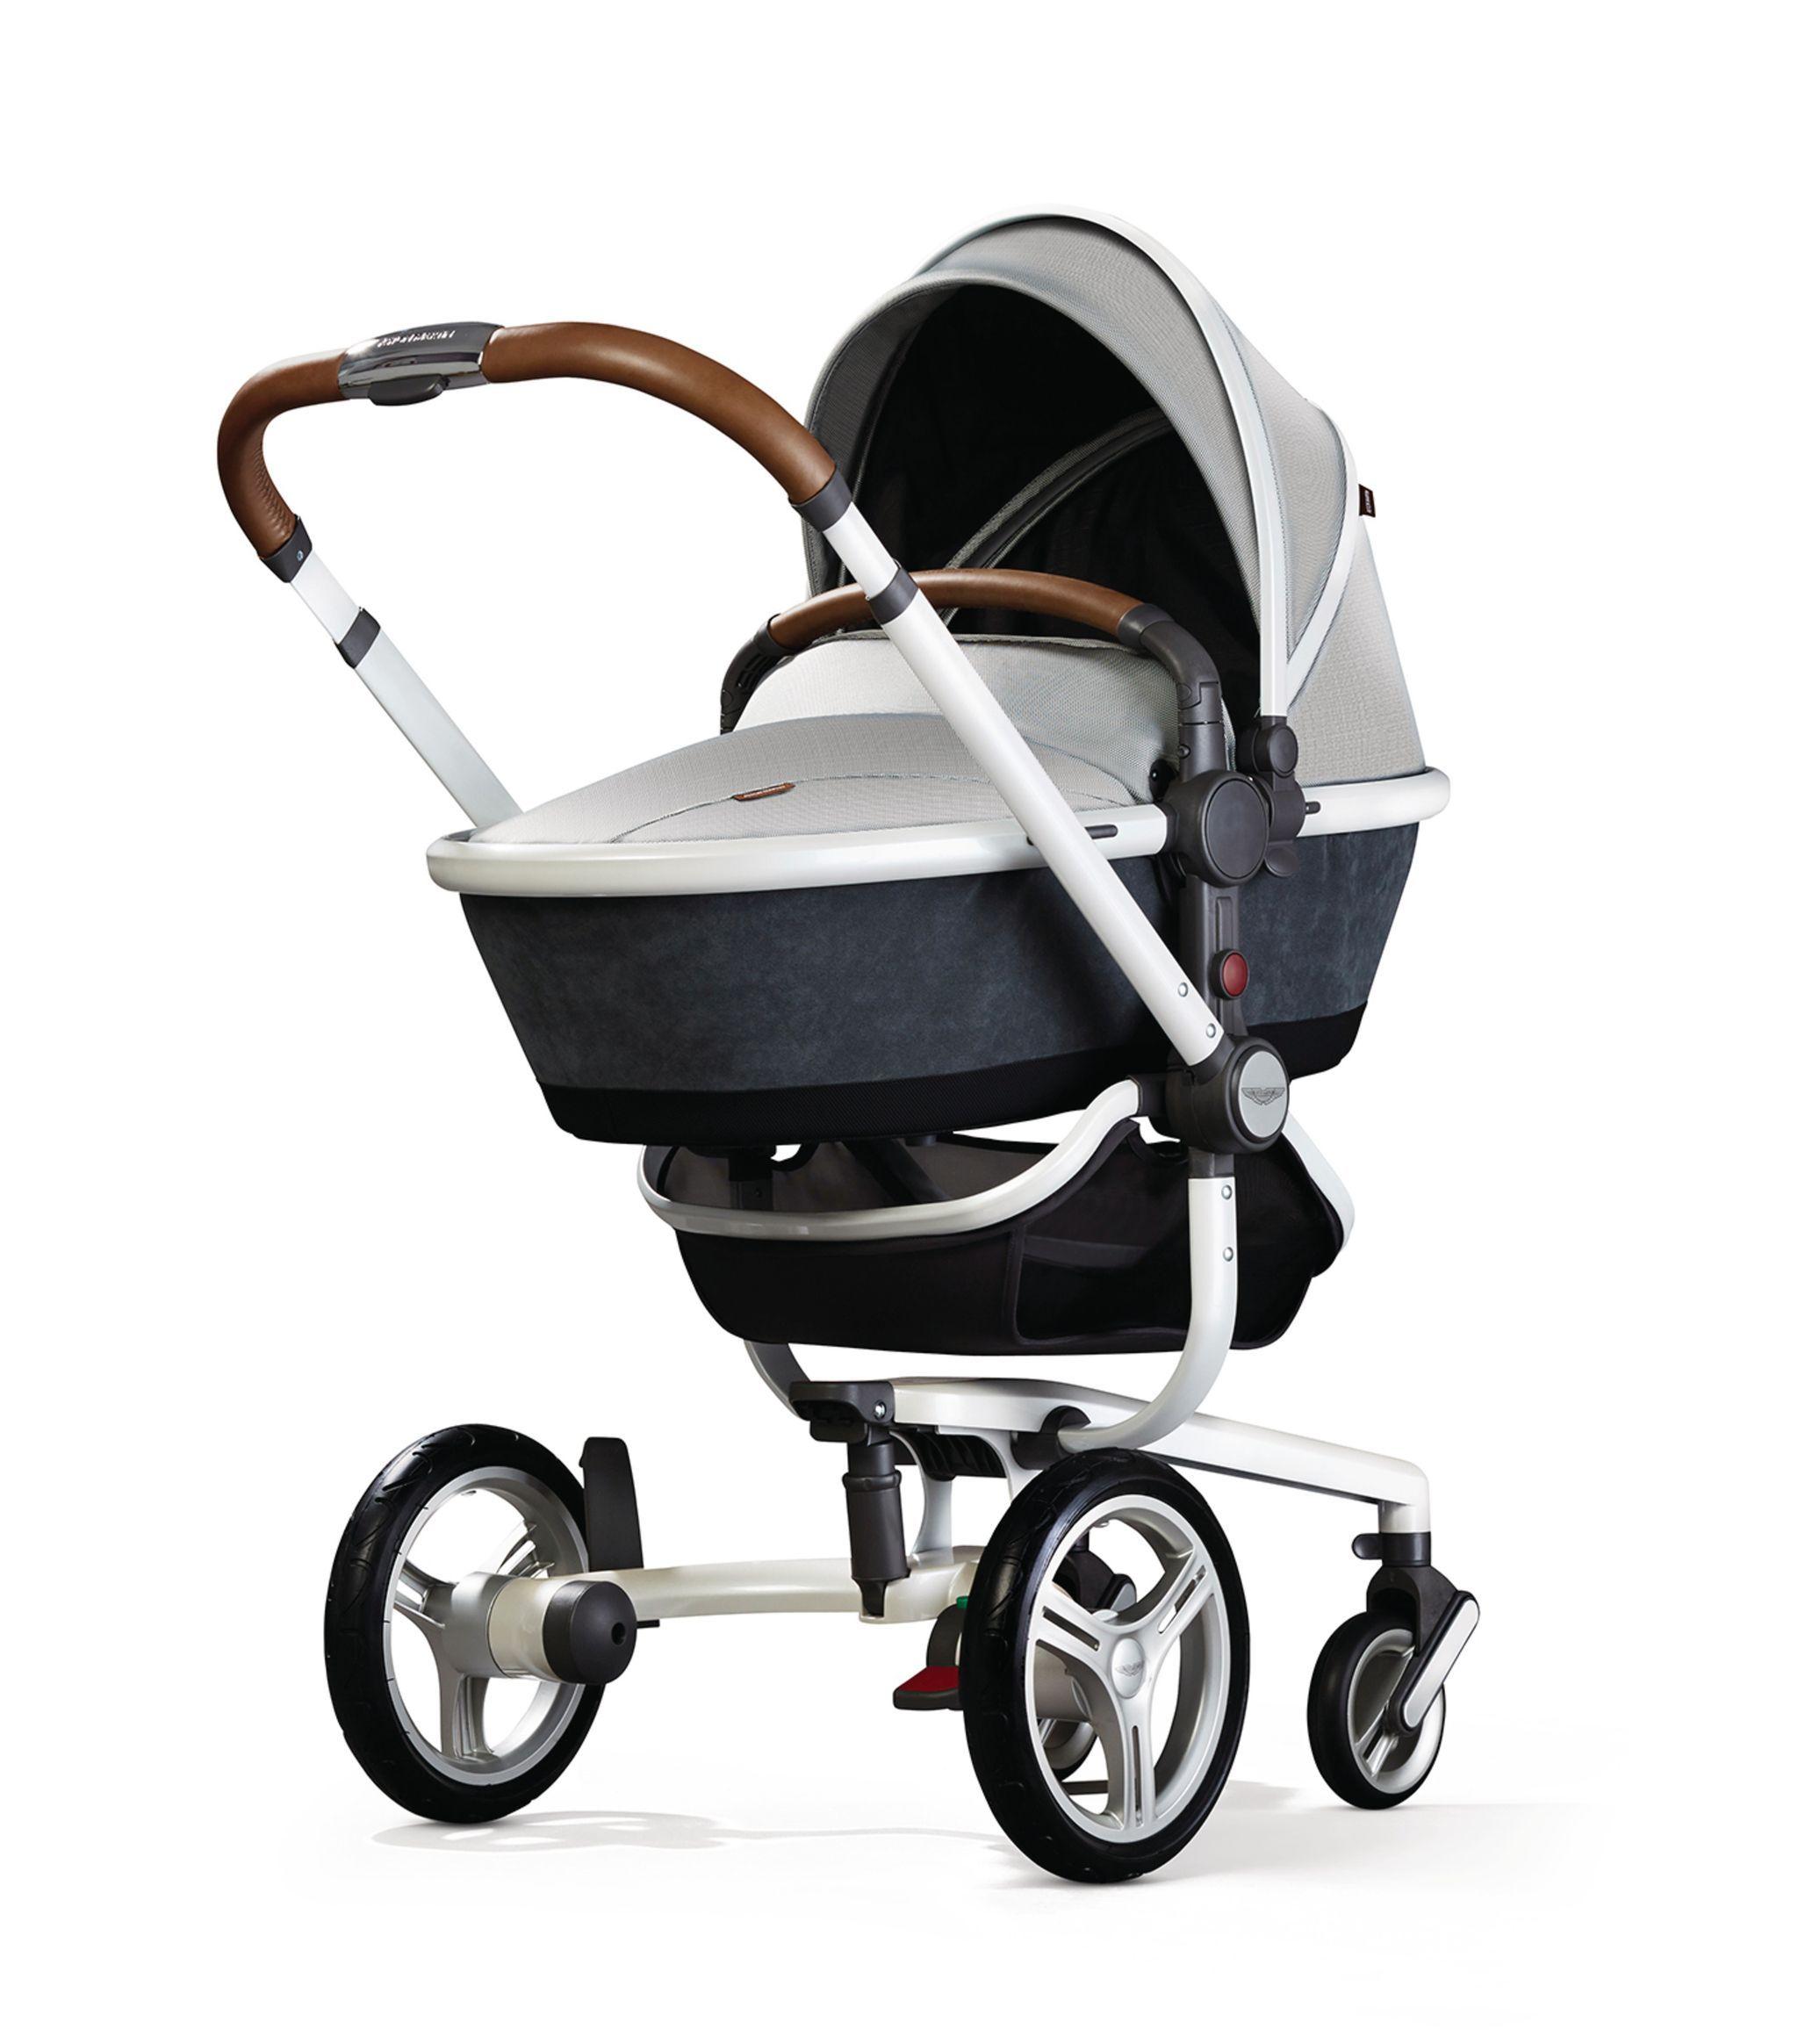 Silver Cross Silver Surf Aston Martin Edition Harrods Com Baby Strollers Aston Martin Stroller